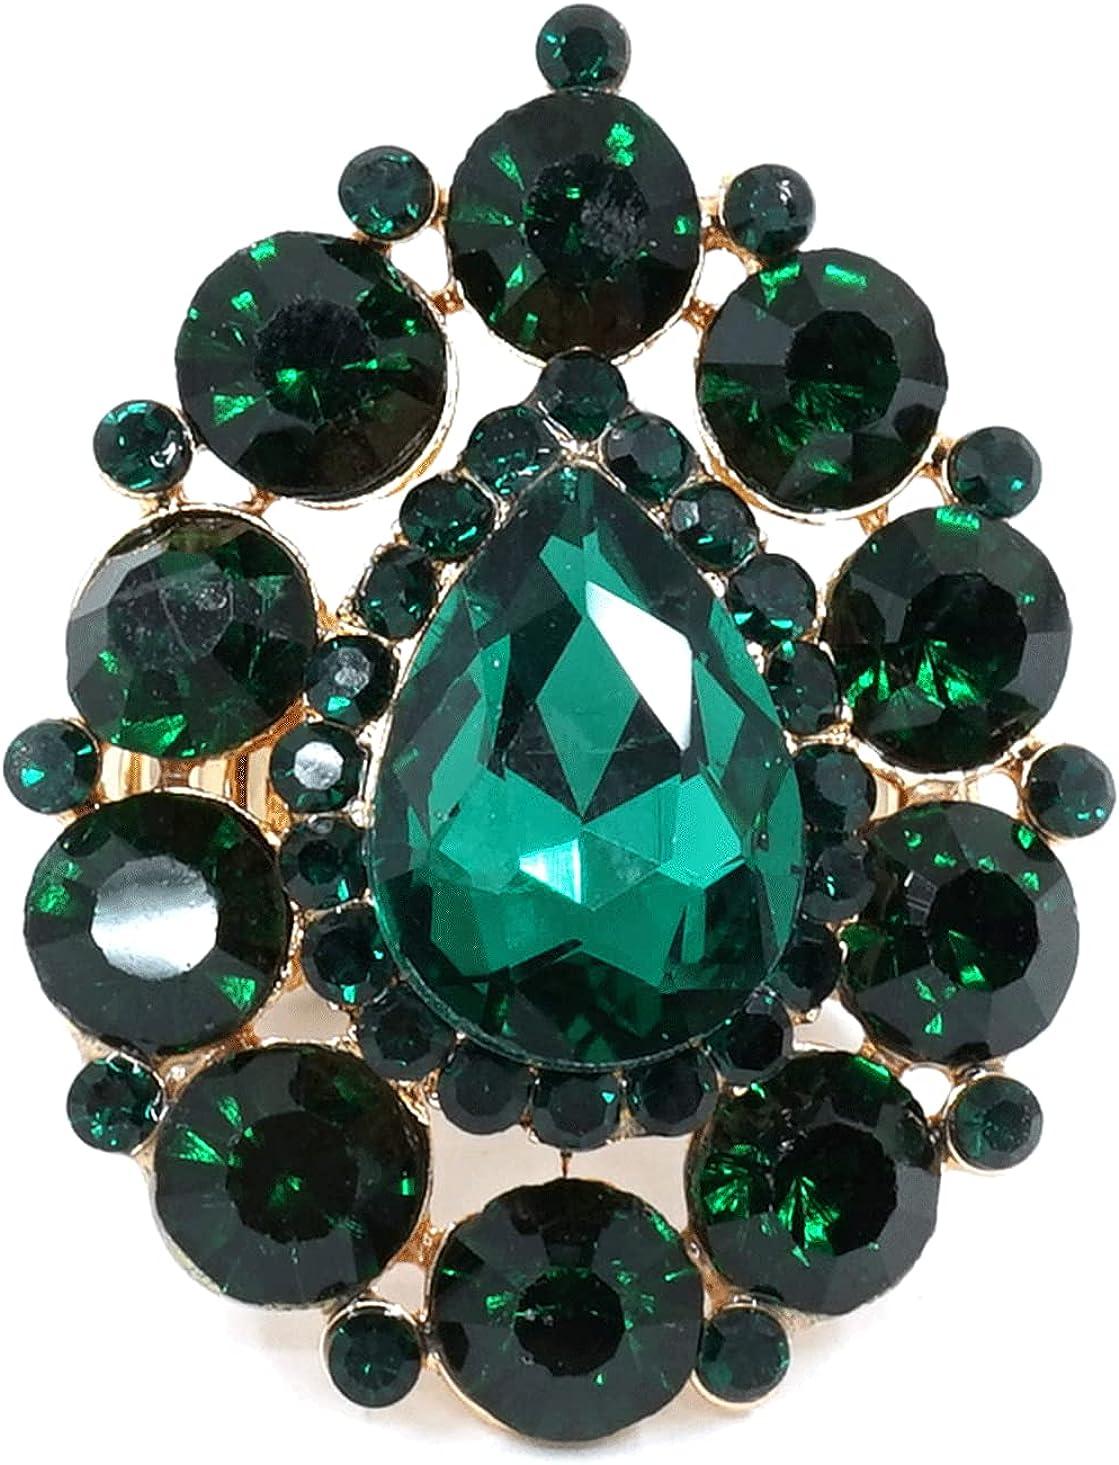 Teri's Boutique Teardrop Sparkle Round Crystal Rhinestone Elegance Beautiful Women Fashion Party Stretch Rings